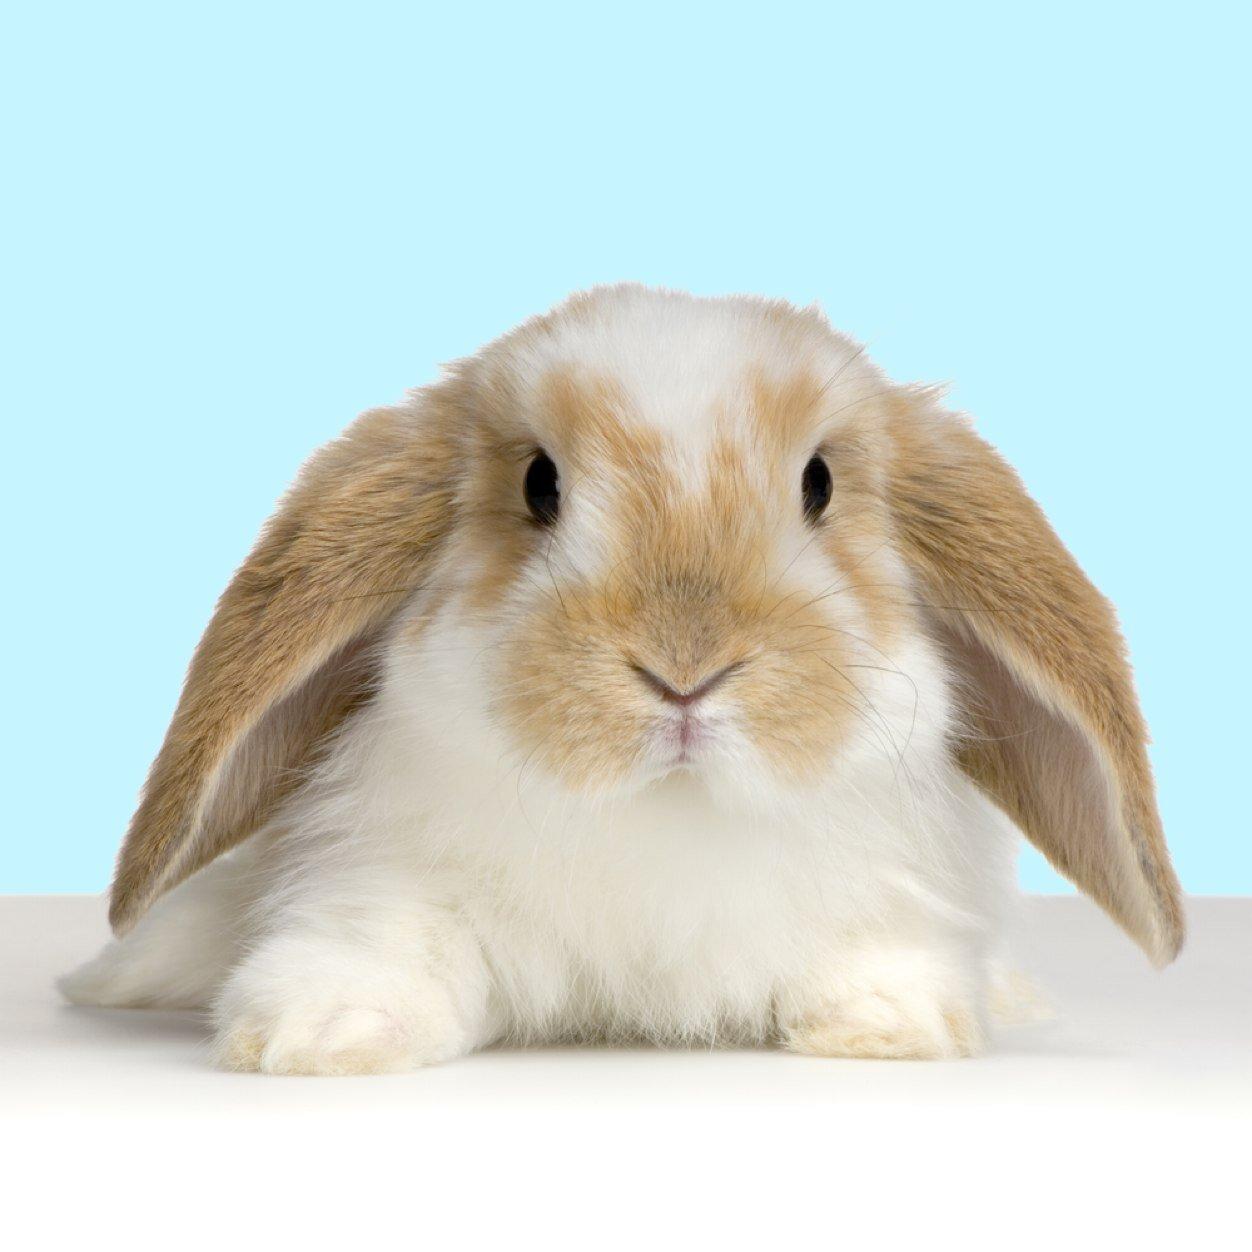 Nice Bunny Photo